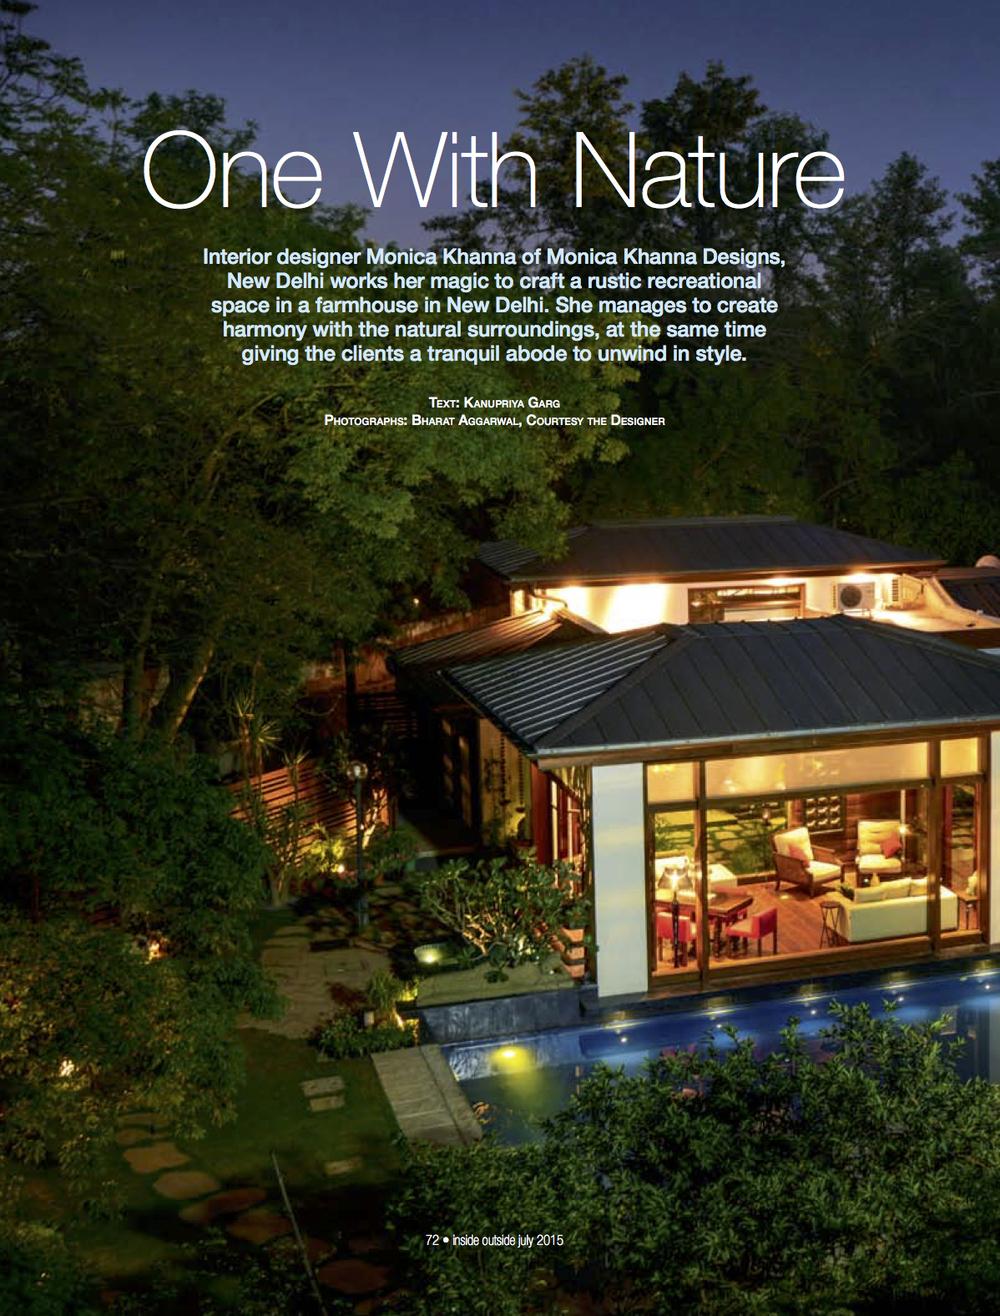 One with nature-Monica Khanna.jpg